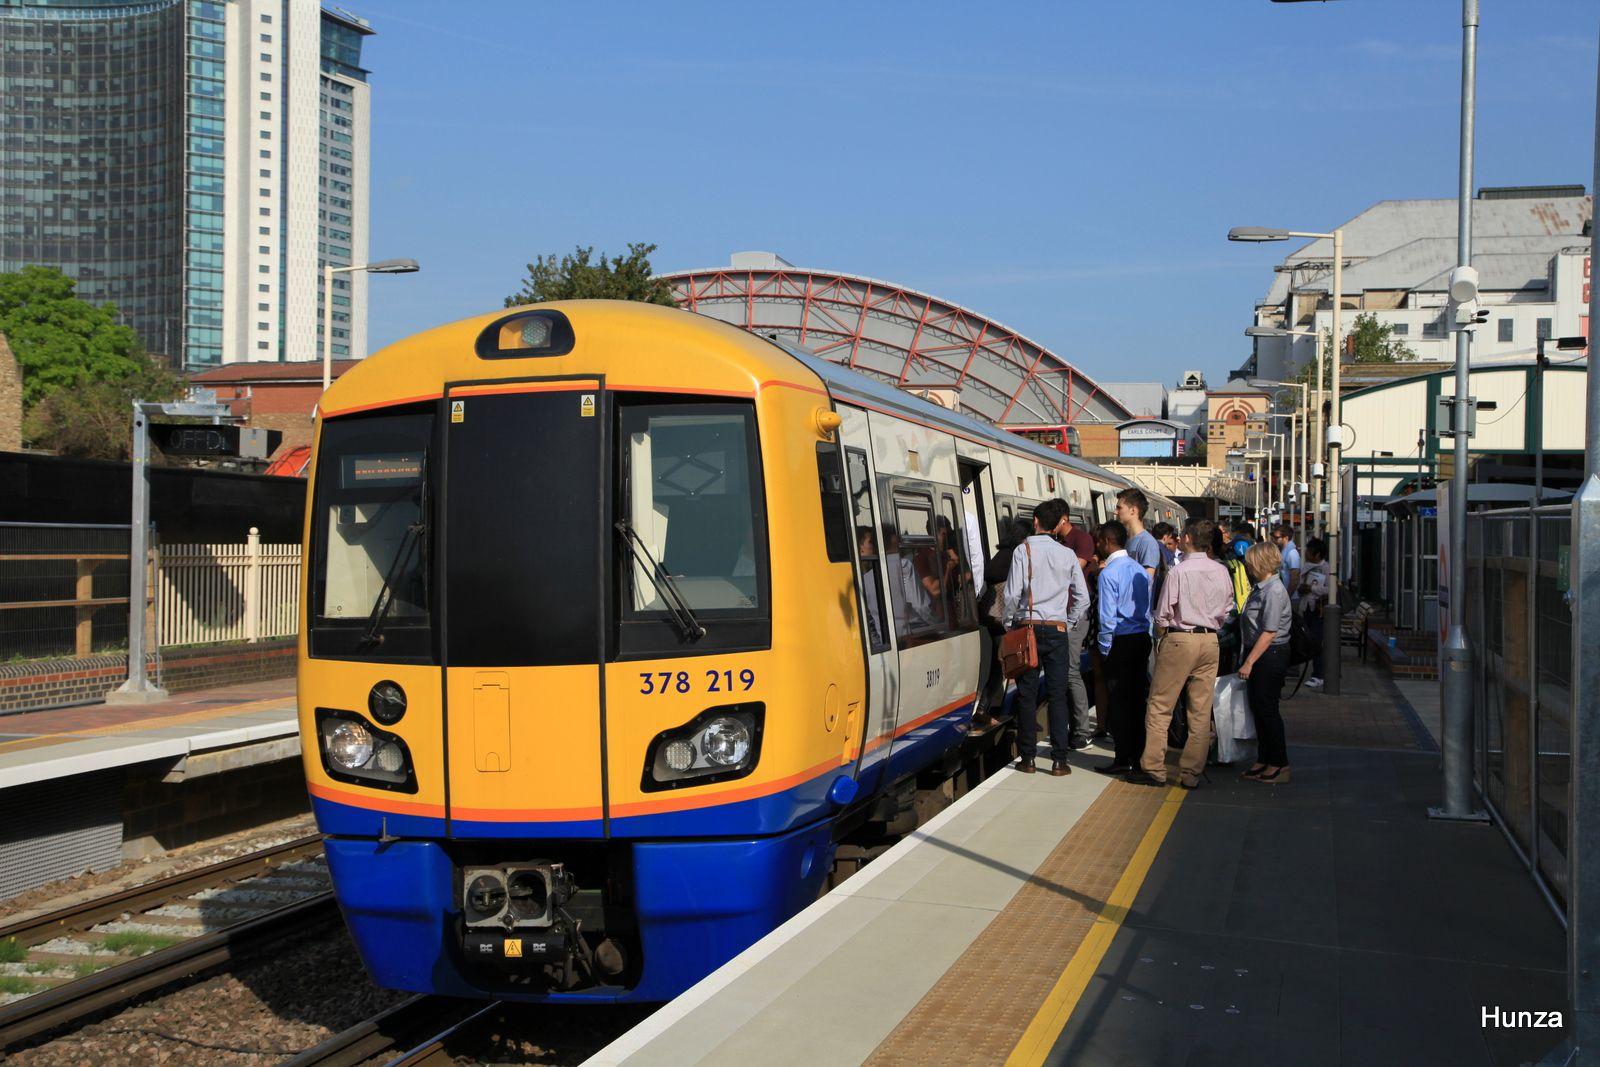 Class 378 n°378 219 à West Brompton station, London Overground (31 juillet 2014)